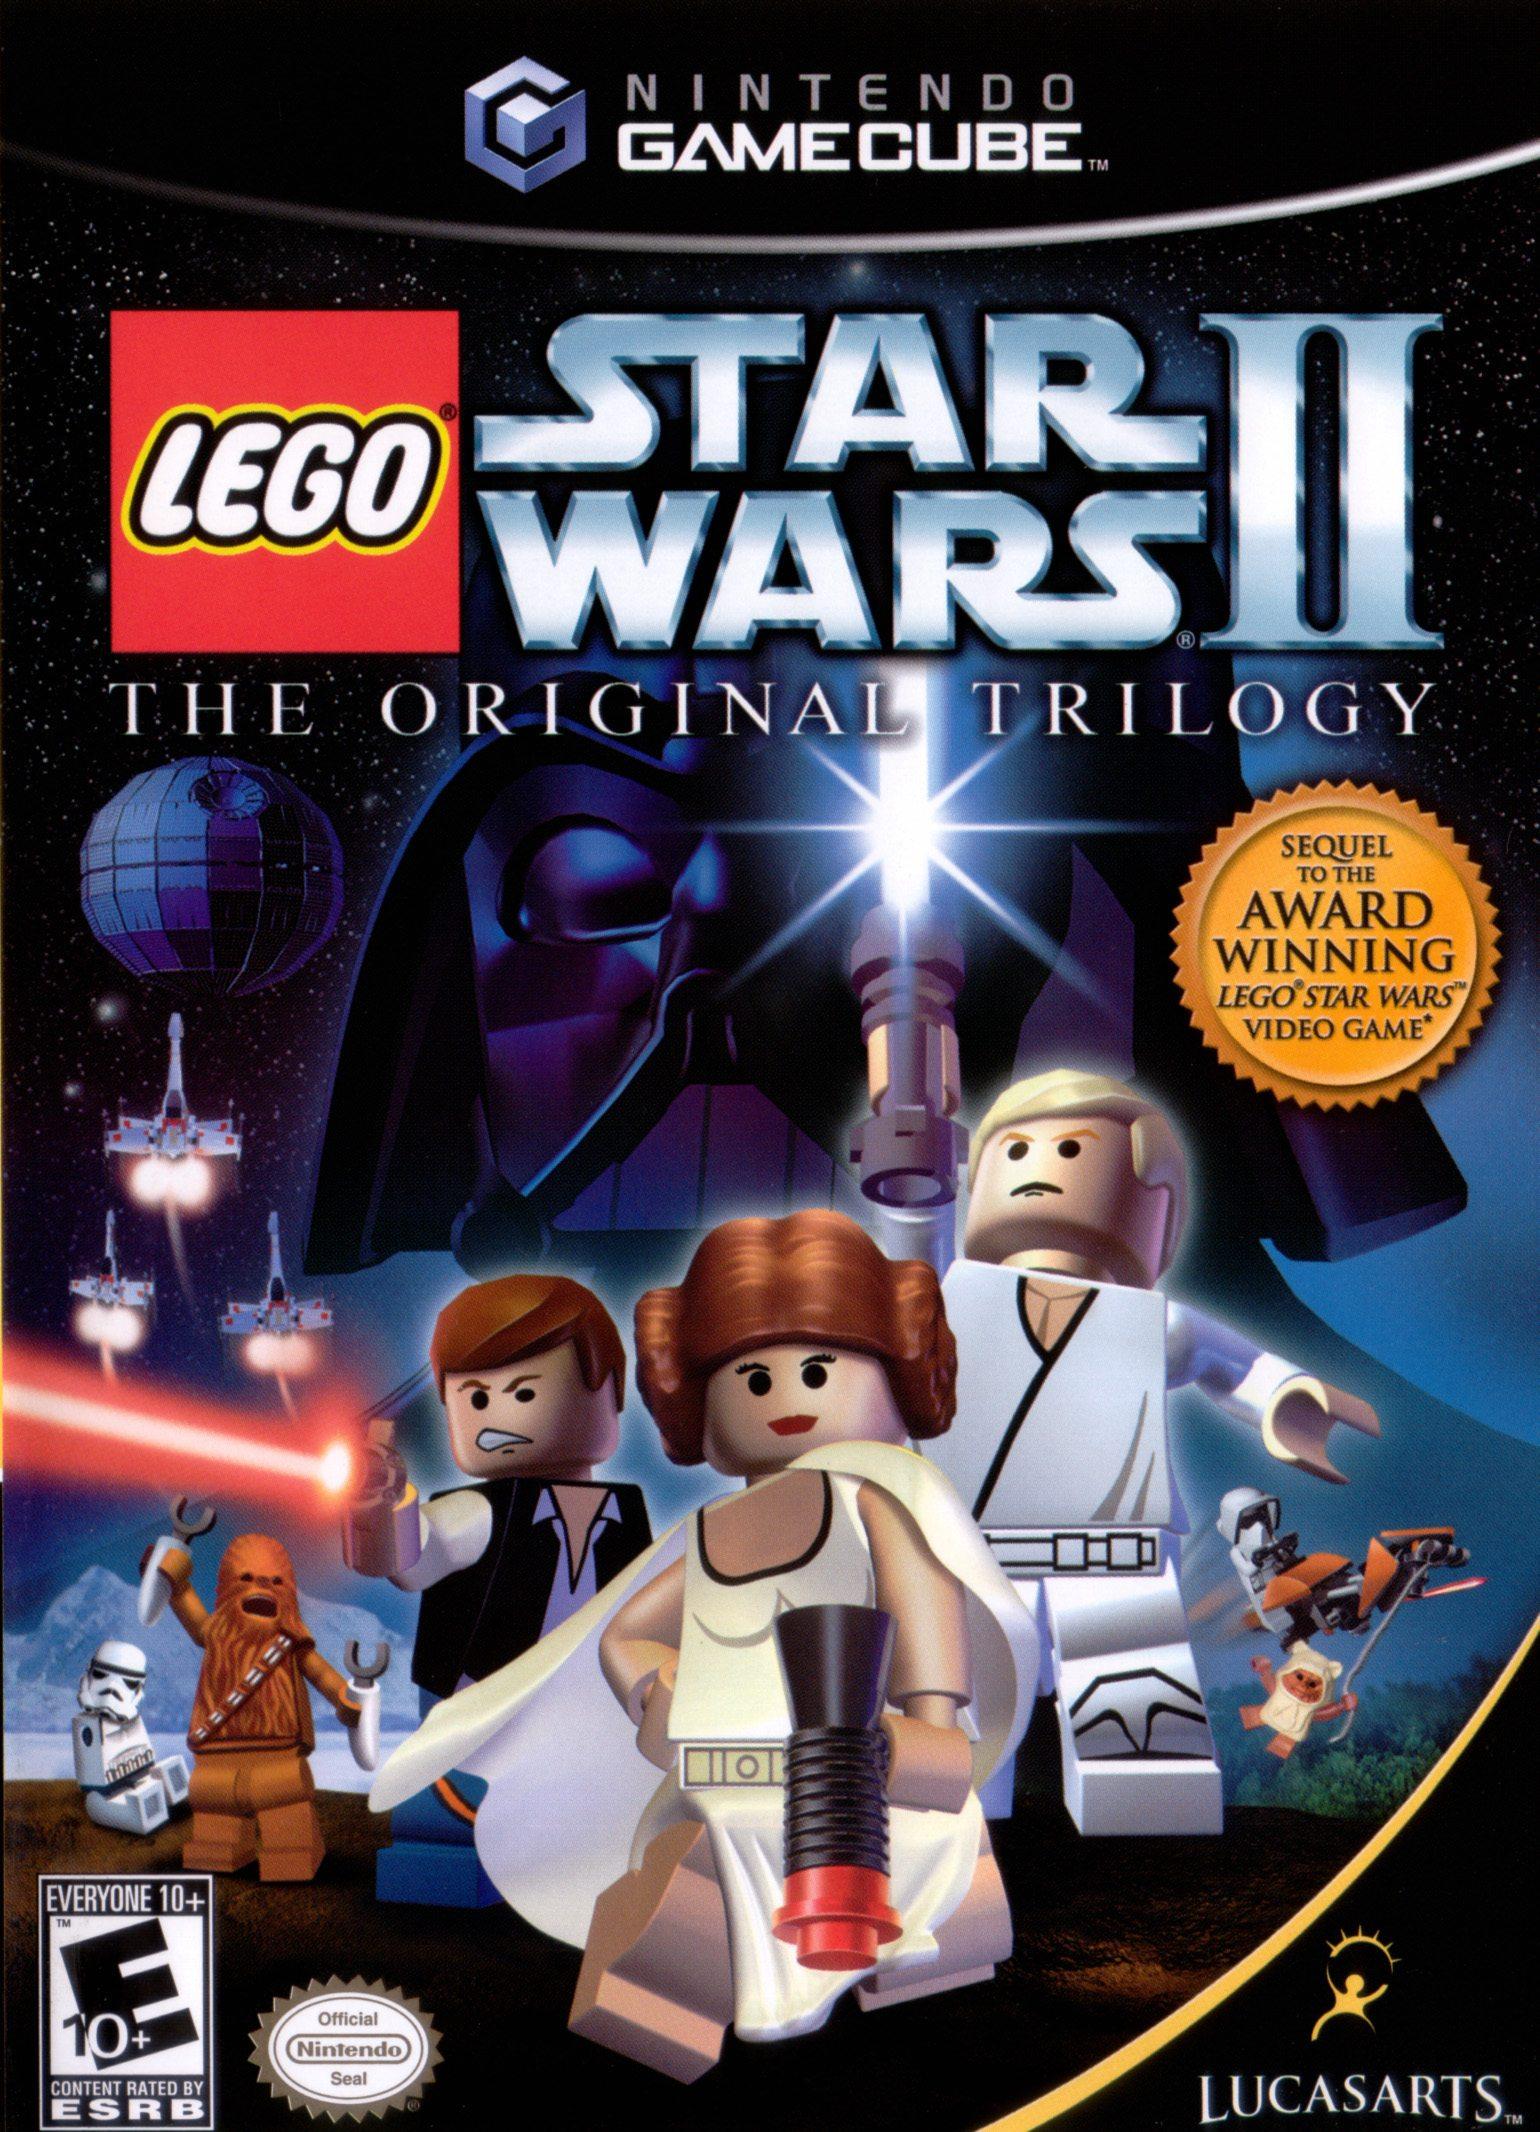 Rom juego LEGO Star Wars II The Original Trilogy